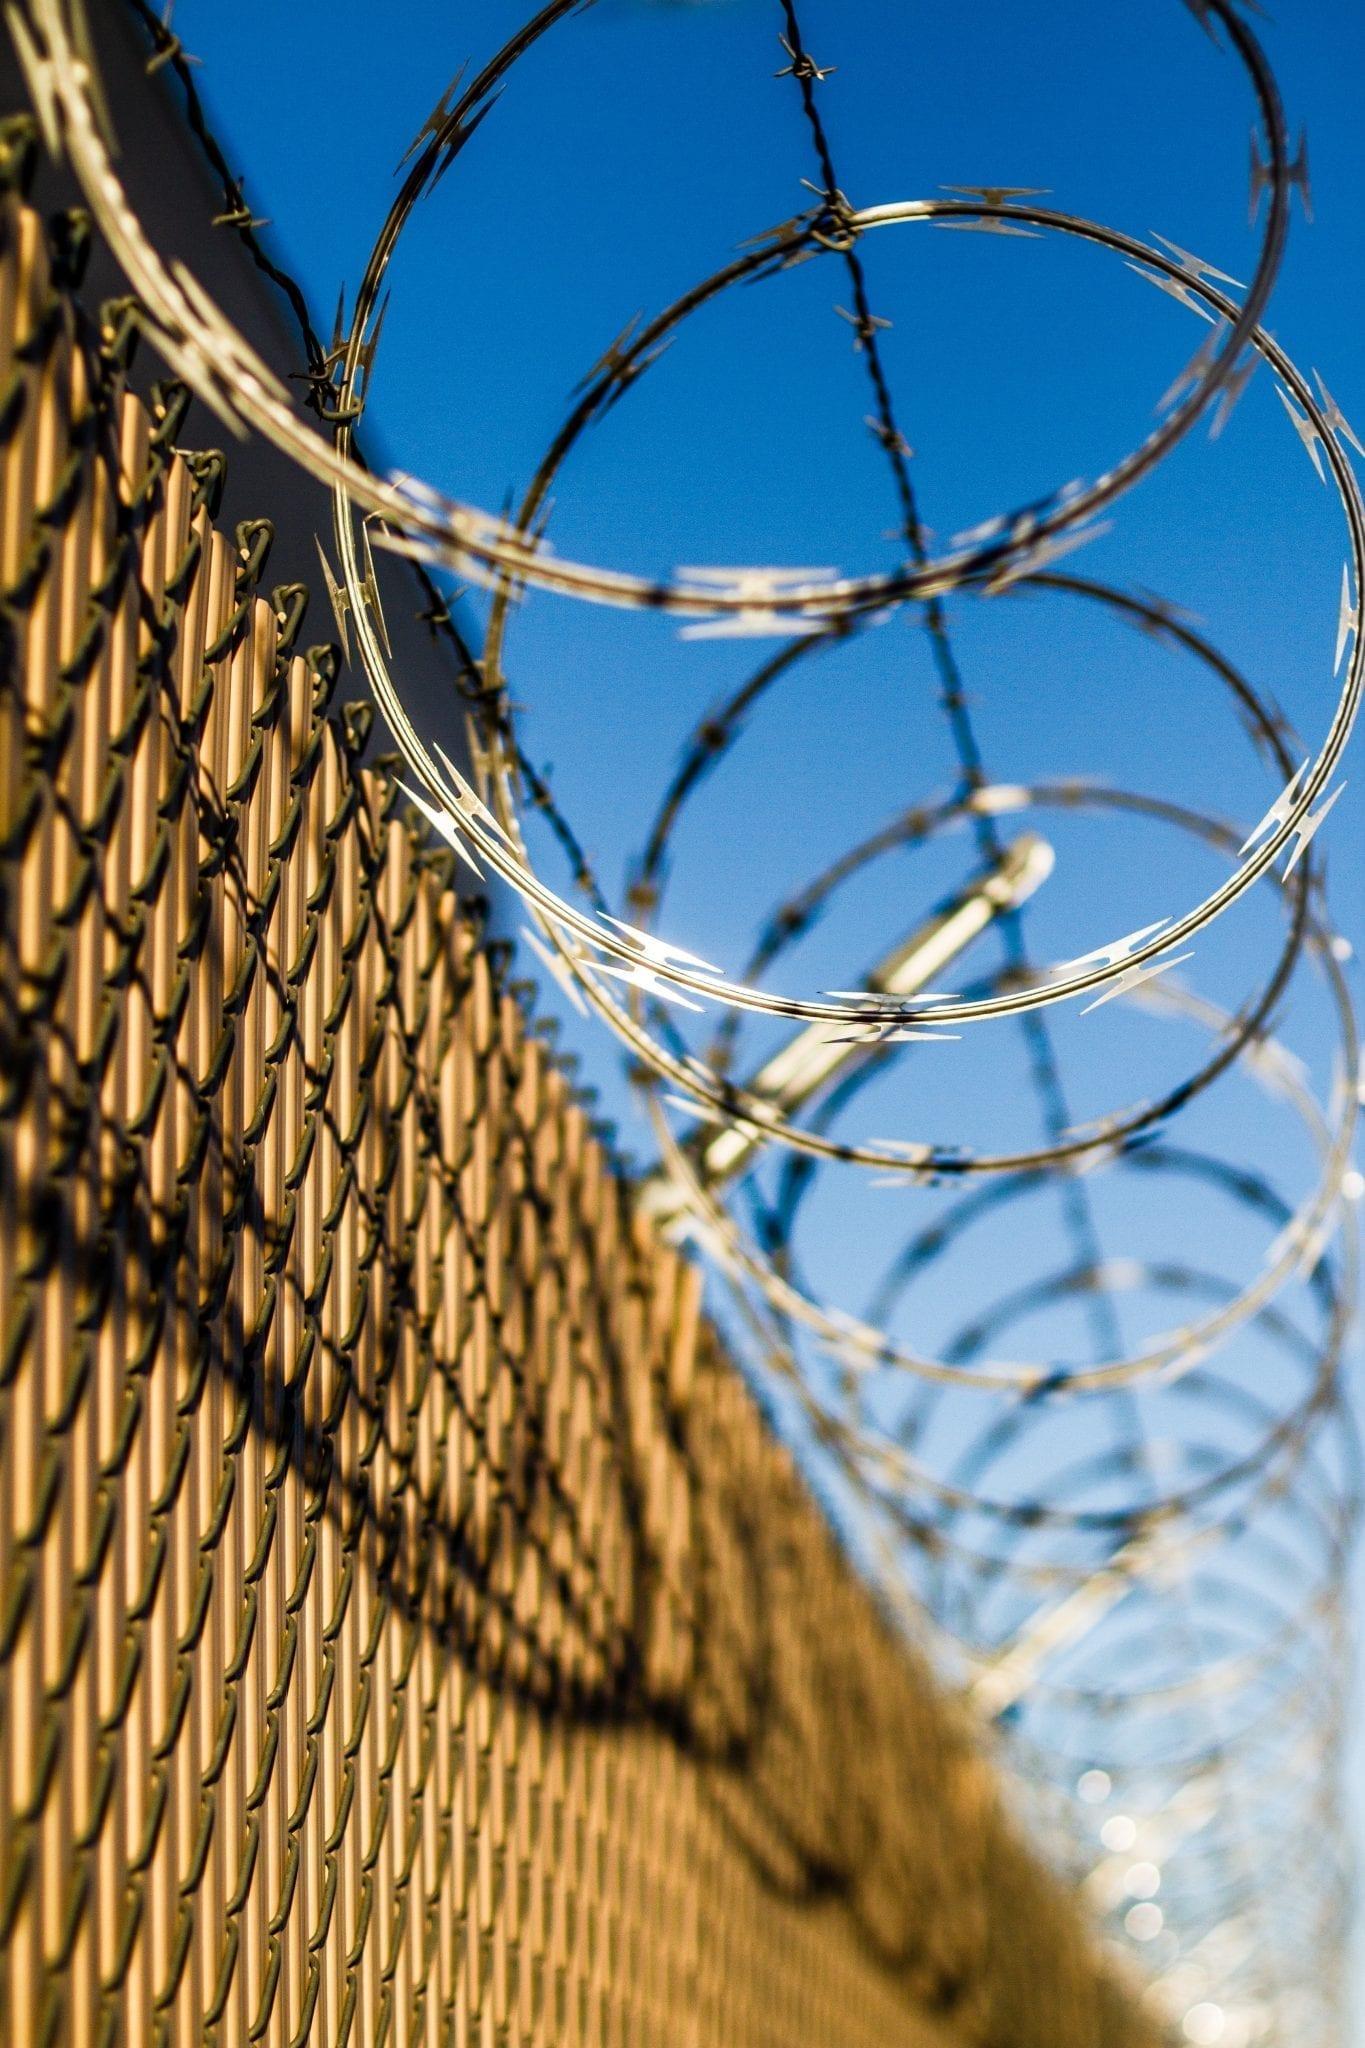 Missouri Prison Guards Face Harassment, State Settles Cases